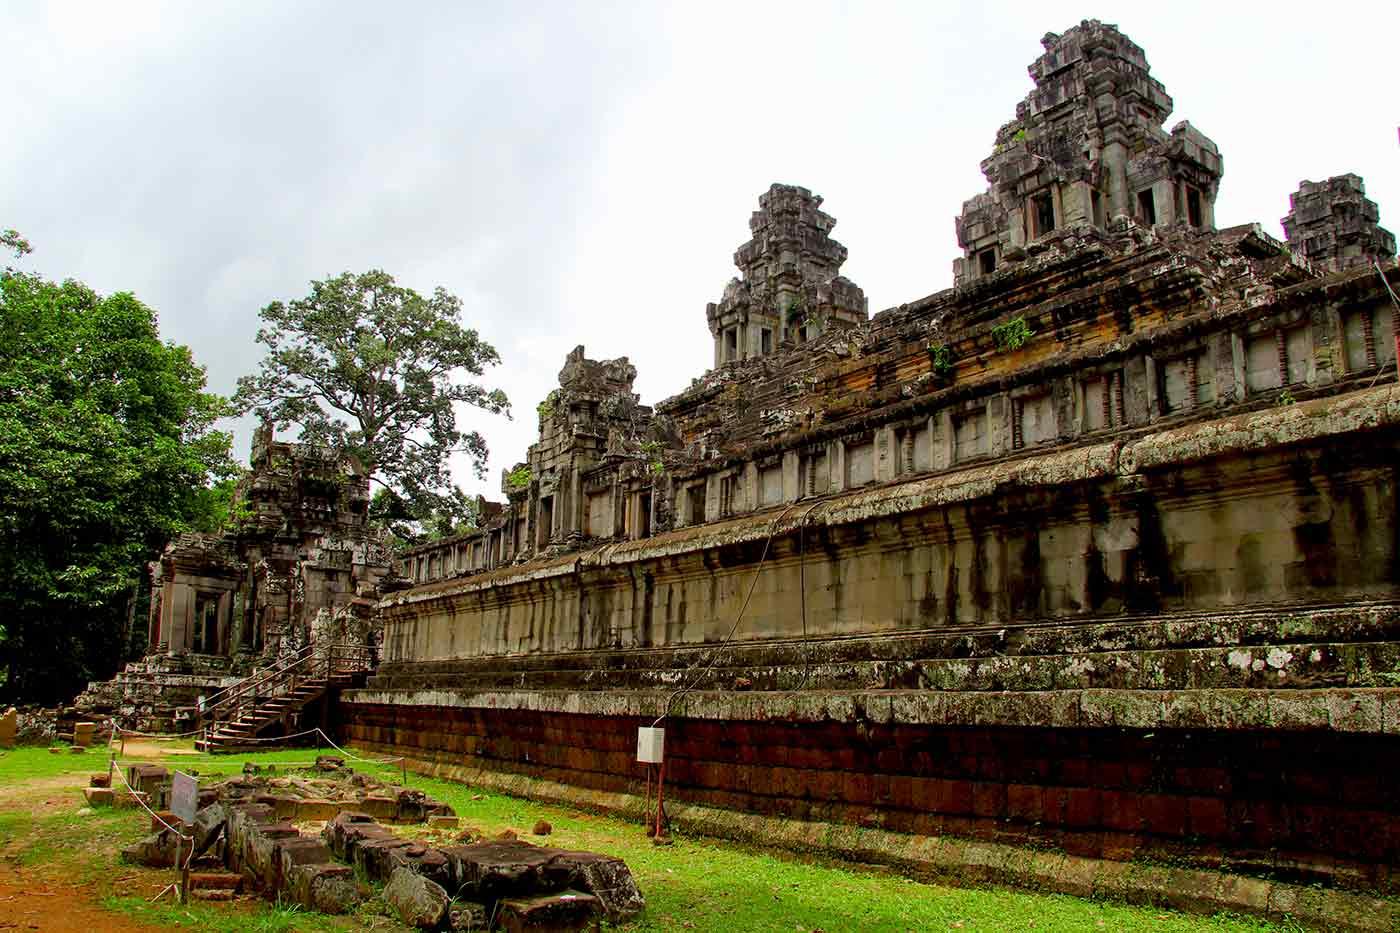 Ta Keo - Angkor Temple, Cambodia